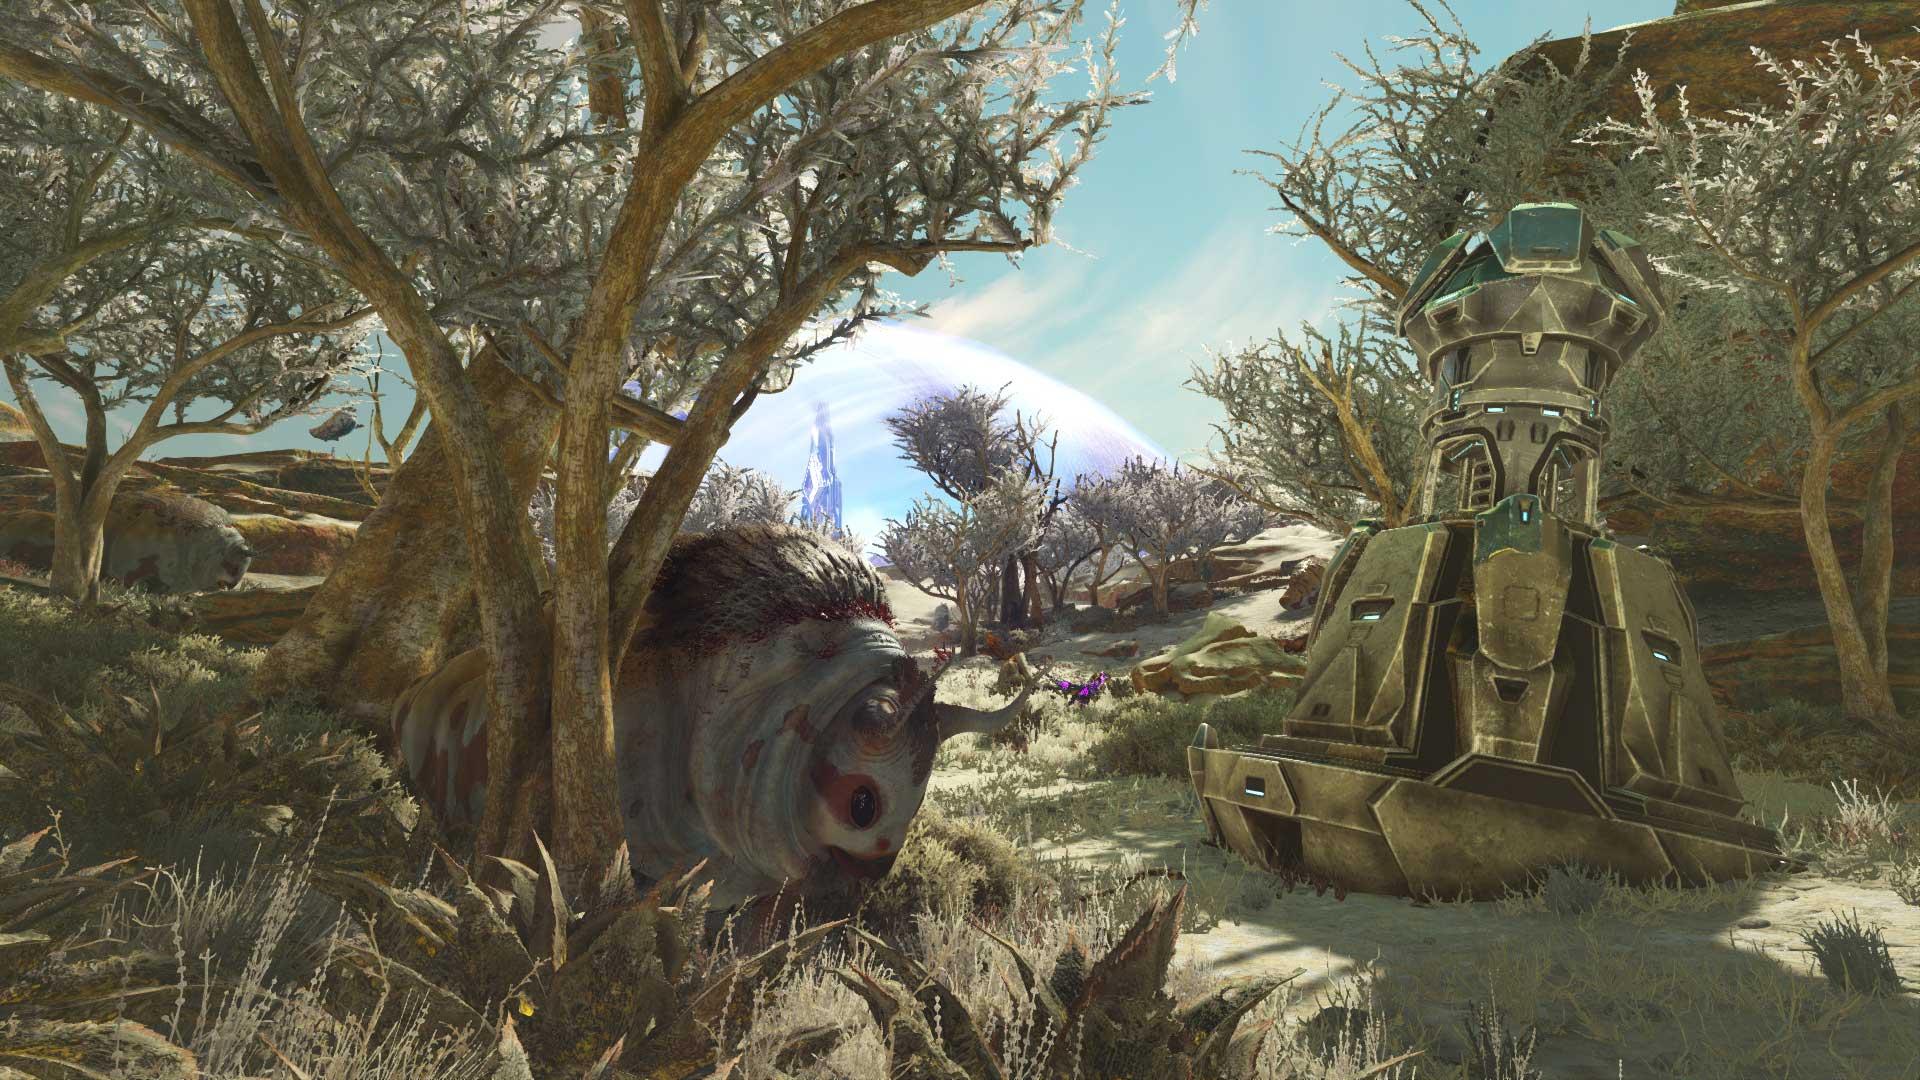 Ark Survival Evolved Tuxdbcom - flora frenzy roblox combinations